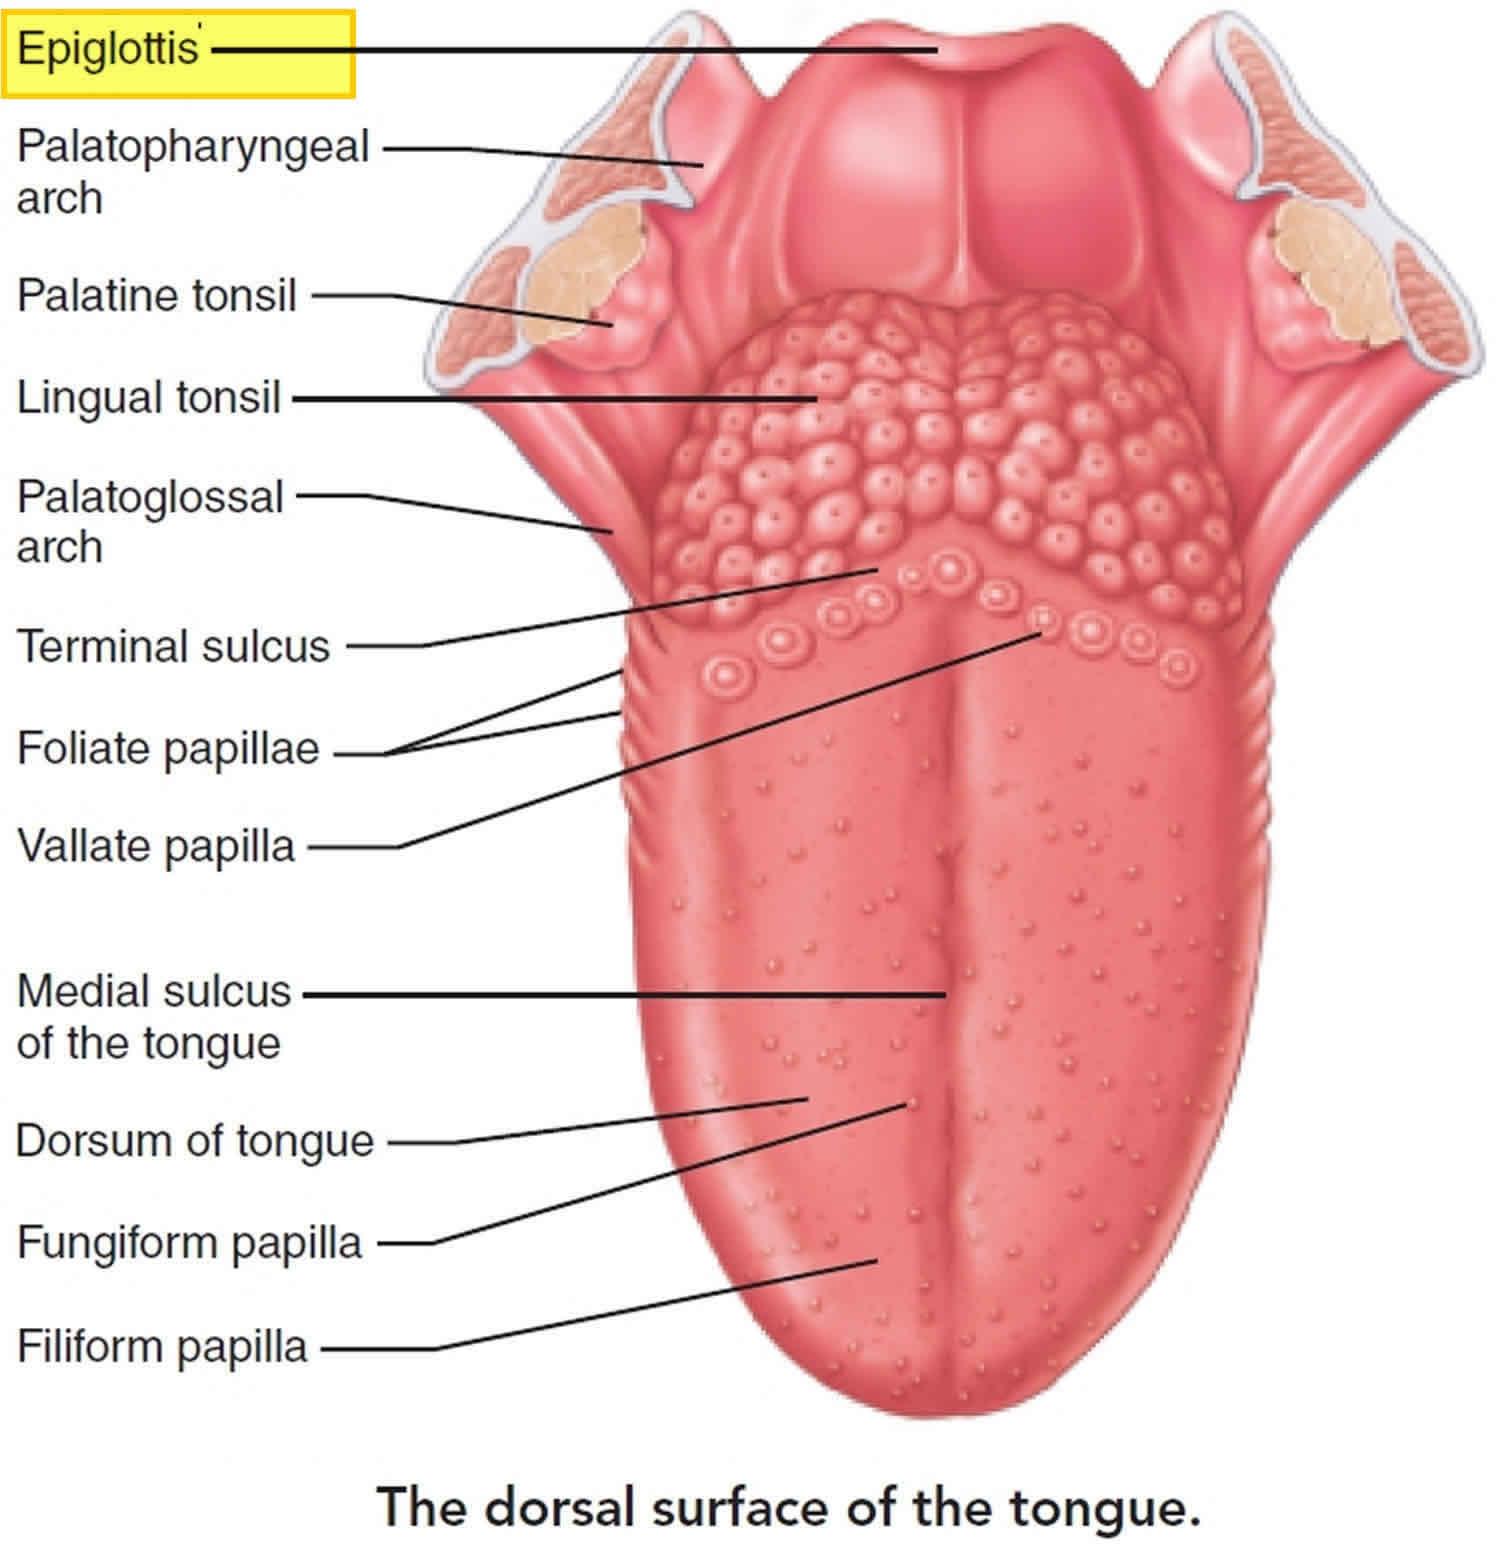 Epiglottis location